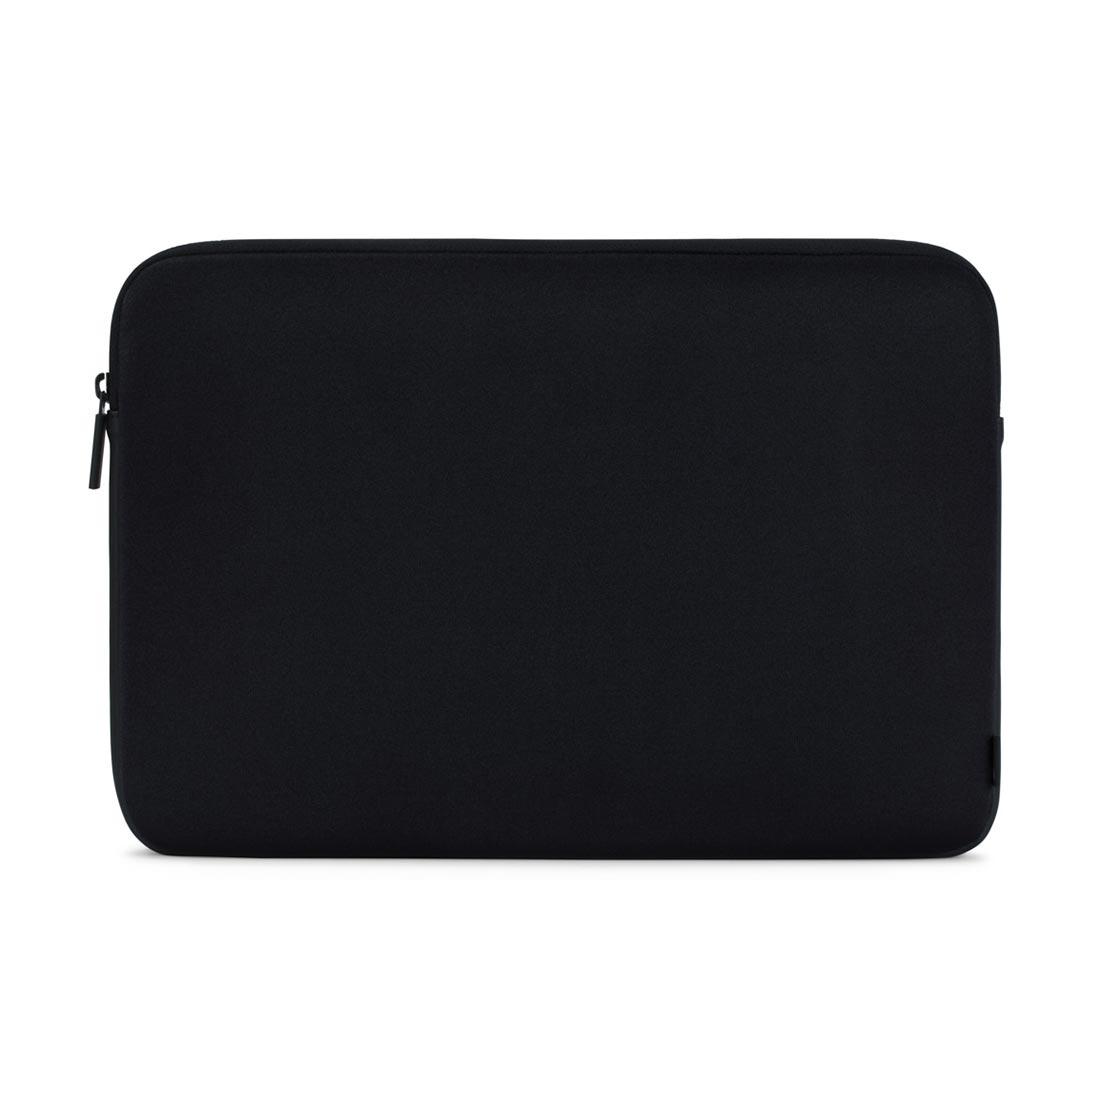 Incase Classic Sleeve MacBook 15″ Ariaprene – Black